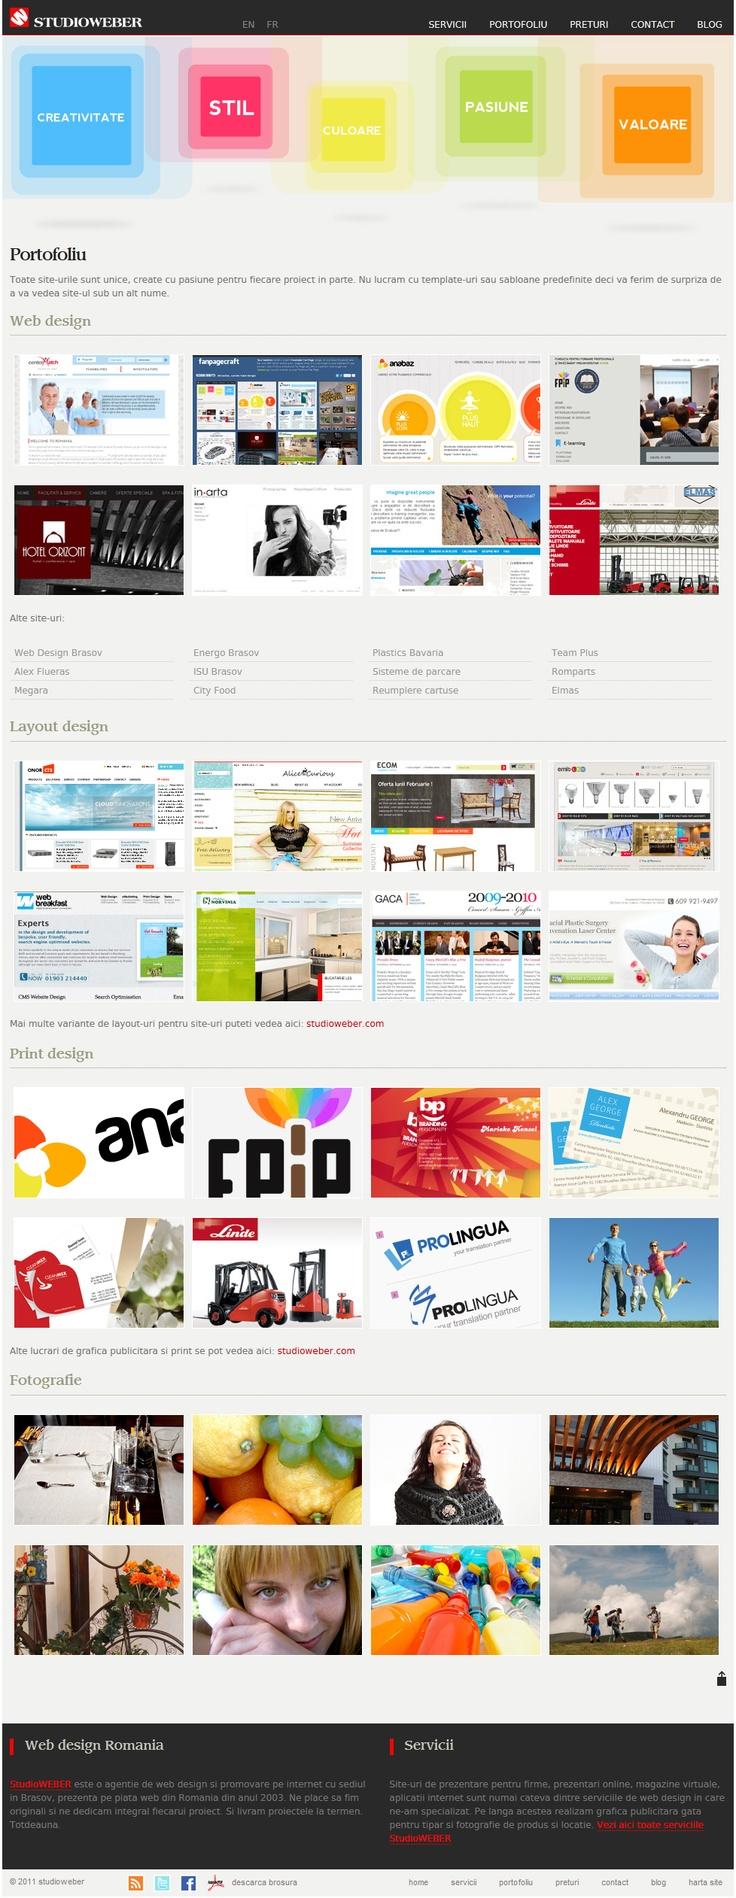 Web design and development - Content page - http://www.studioweber.ro